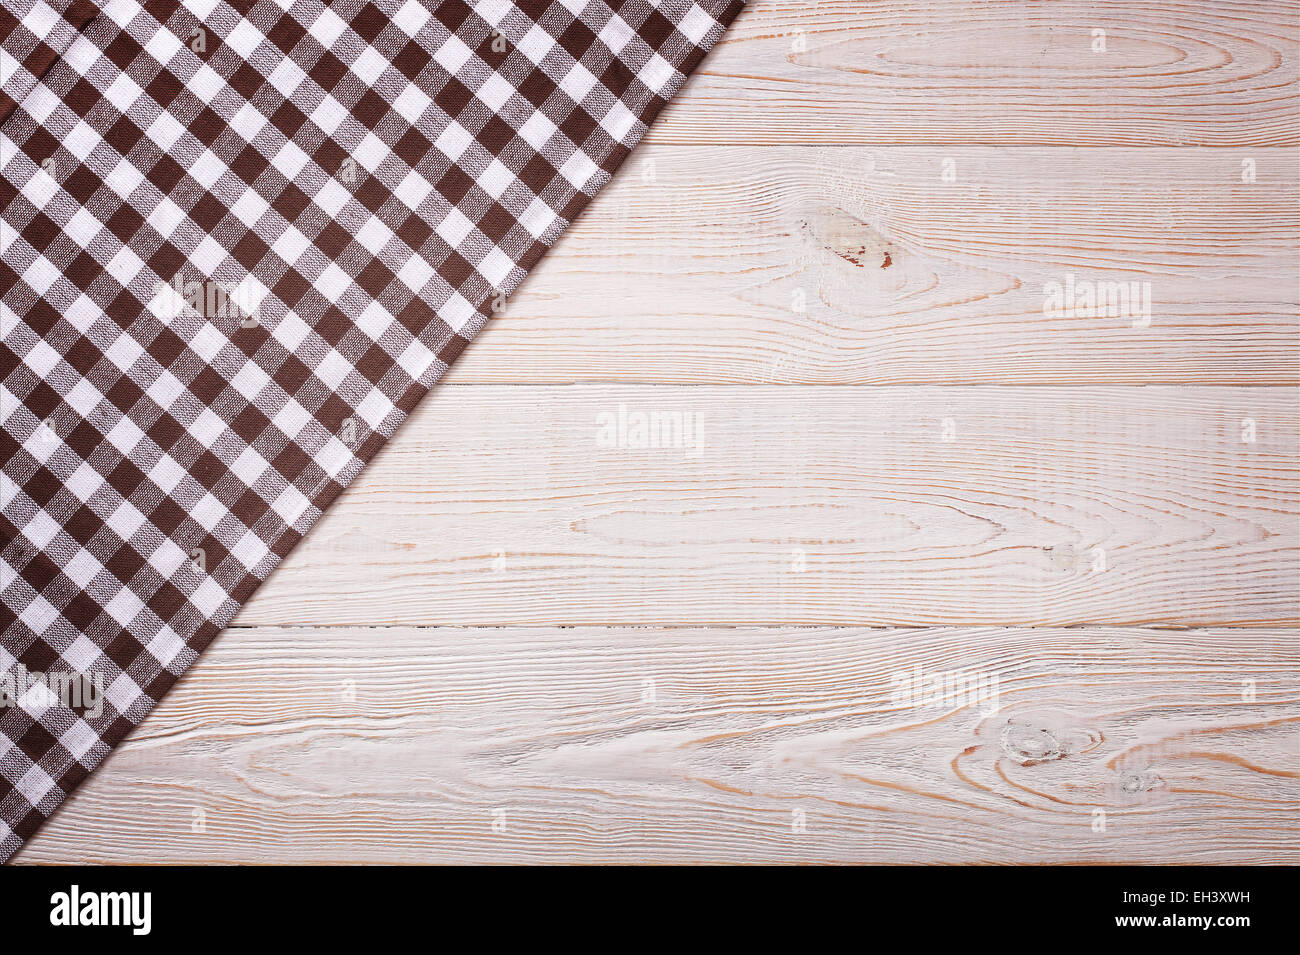 checkered board stockfotos checkered board bilder seite 28 alamy. Black Bedroom Furniture Sets. Home Design Ideas